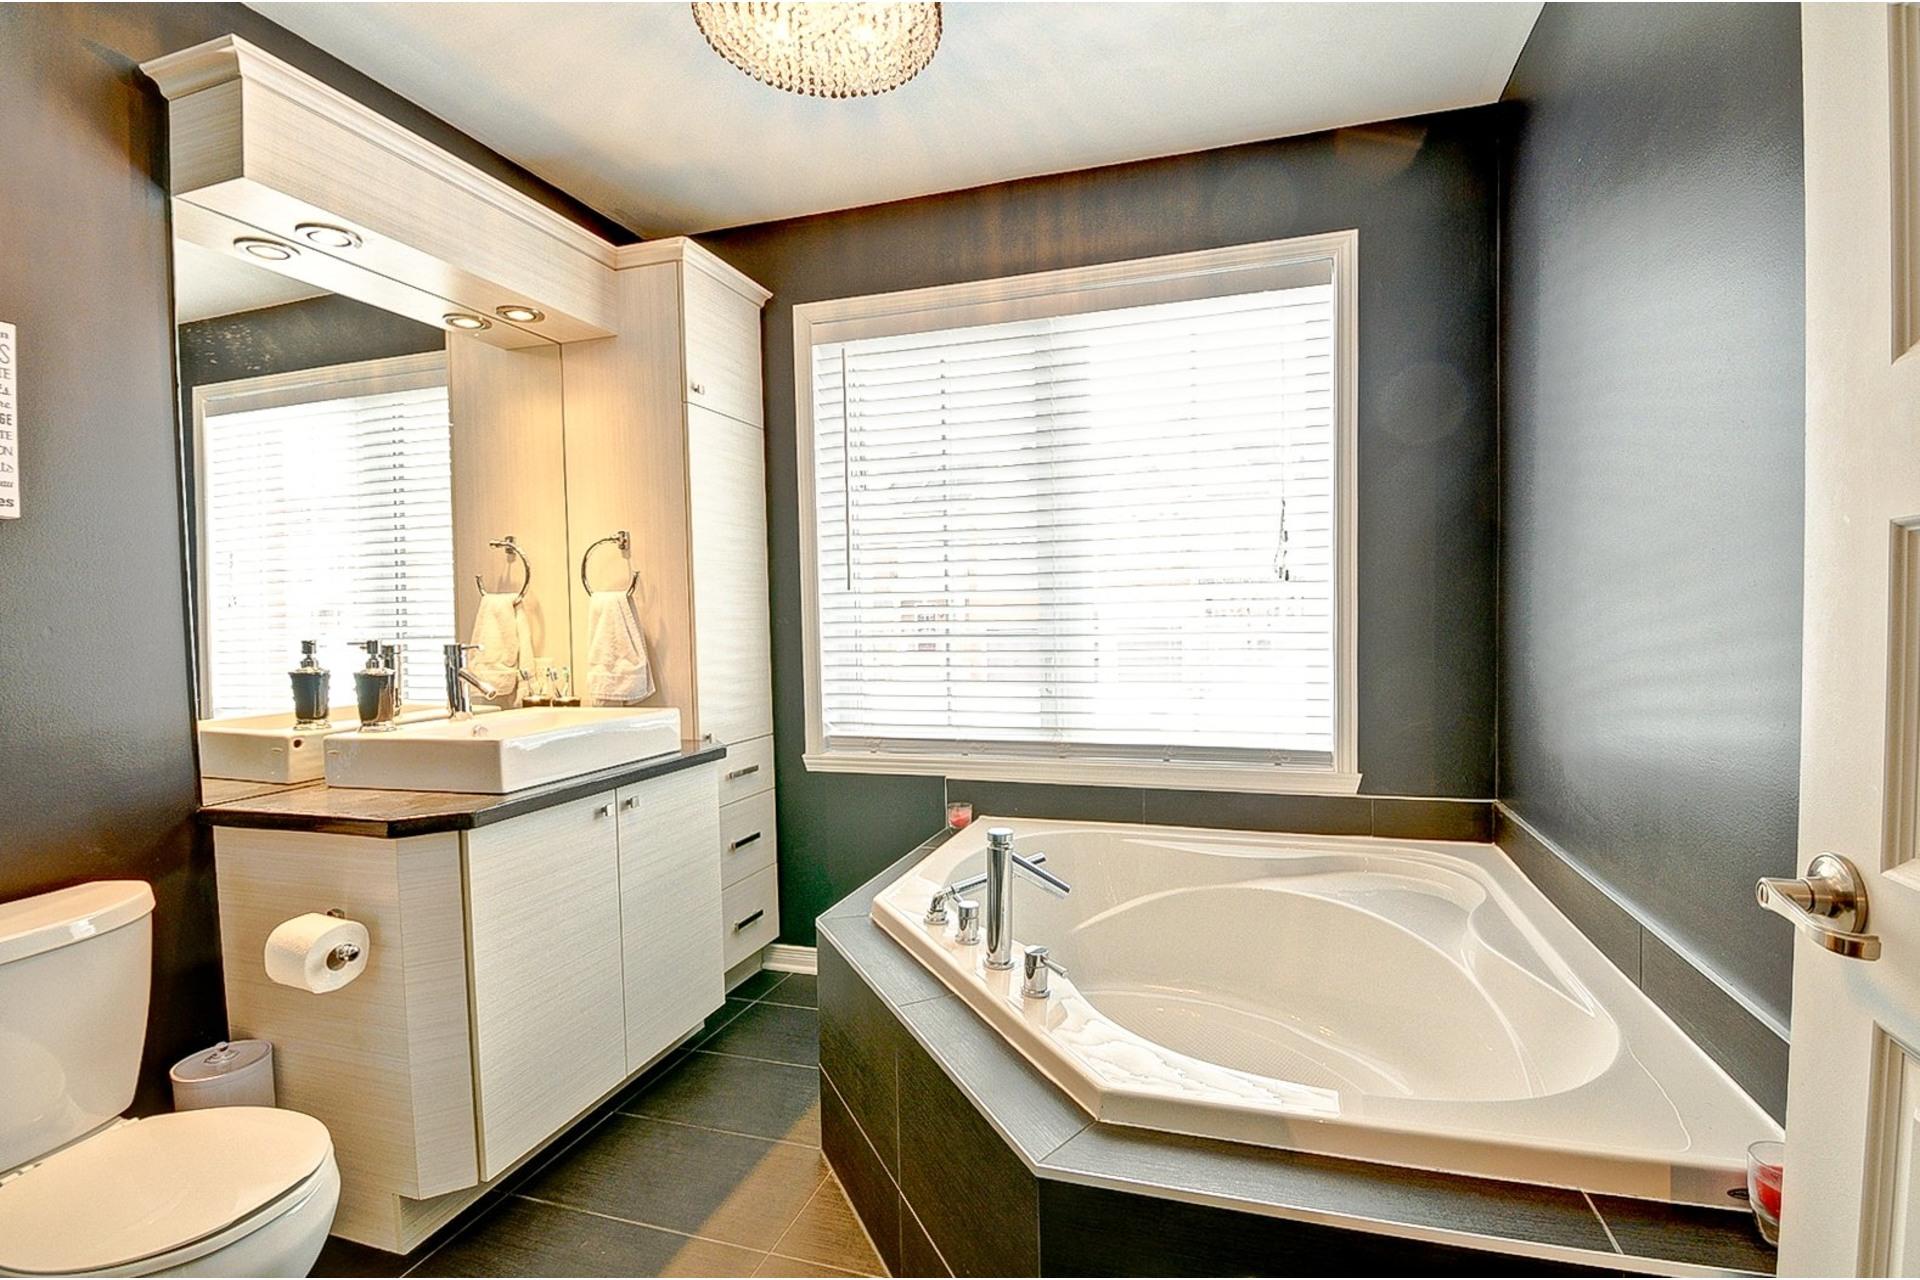 image 18 - Apartment For sale Vaudreuil-Dorion - 7 rooms